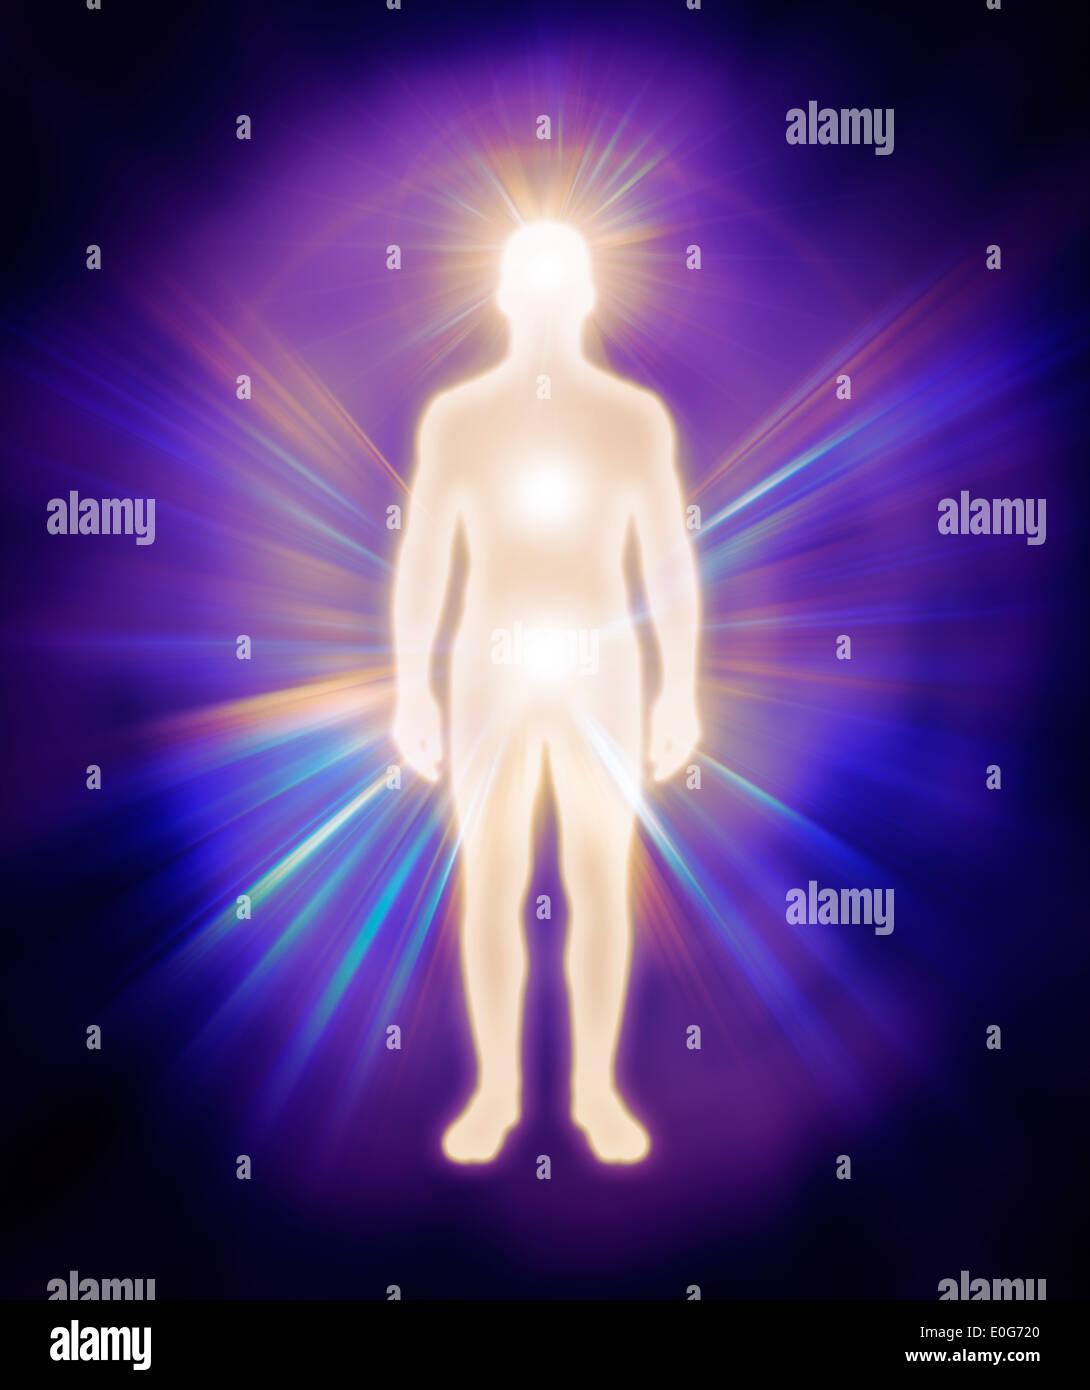 Man energy body. Human luminous being, aura, energy emanations, spiritual concept - Stock Image